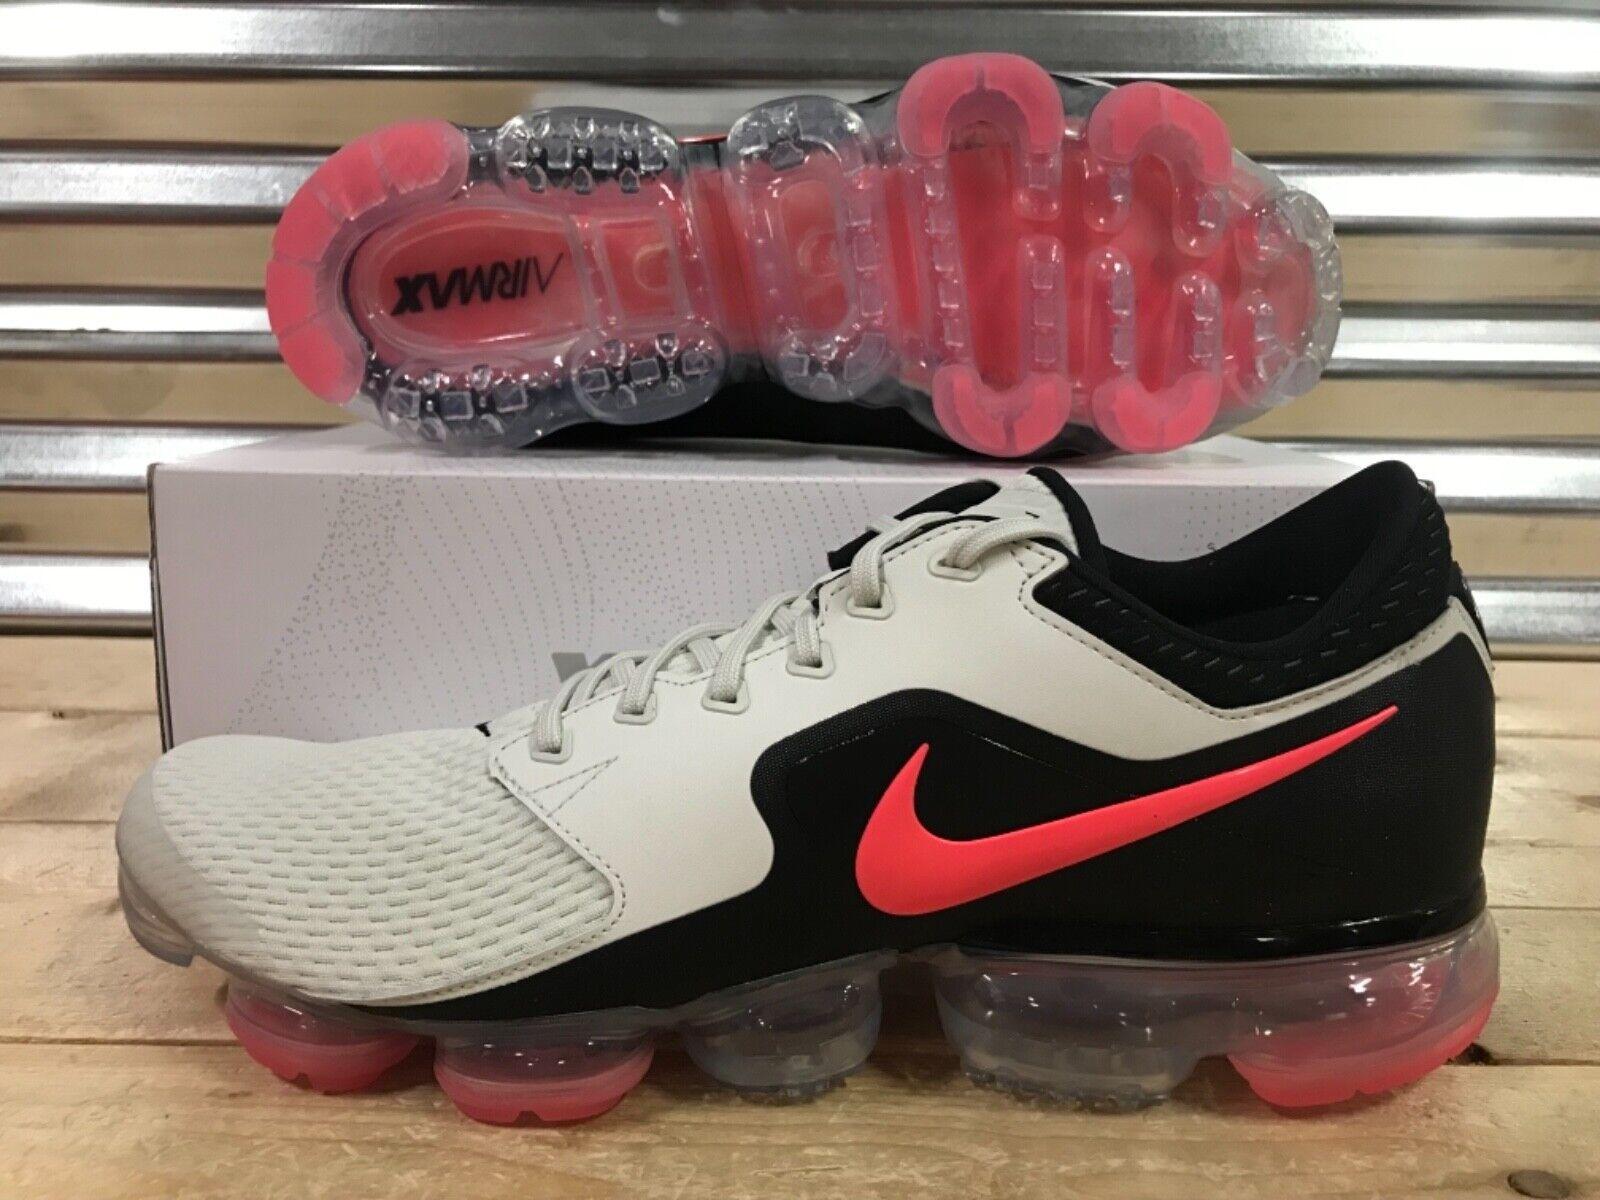 Nike Air Vapormax Running shoes Light Bone Hot Punch SZ 13 ( AH9046-001 )